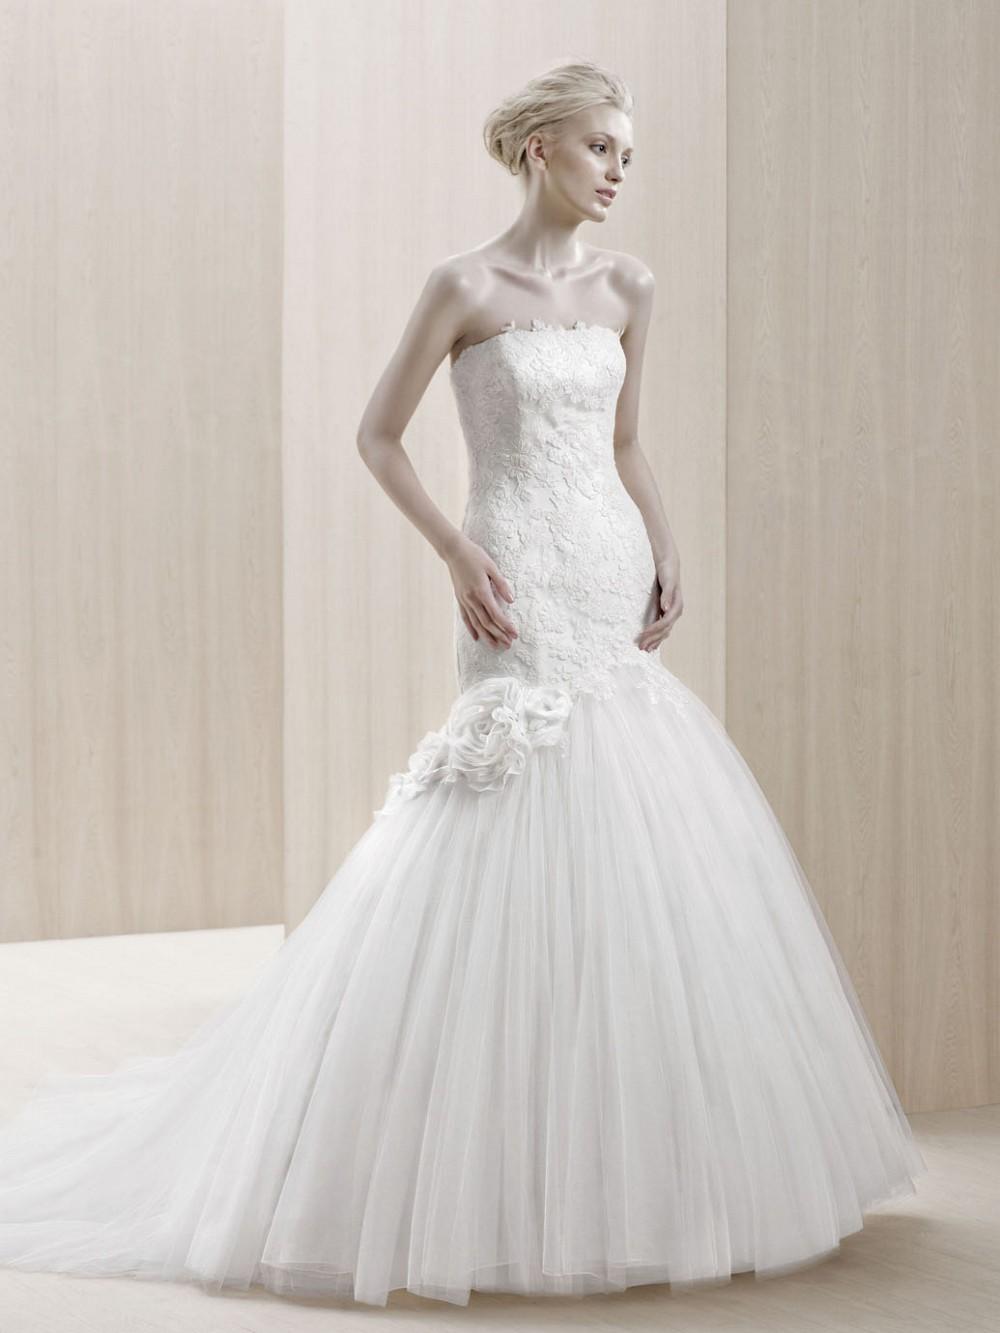 Enzoani blue emporia second hand wedding dress on sale 41 for Second hand wedding dresses for sale